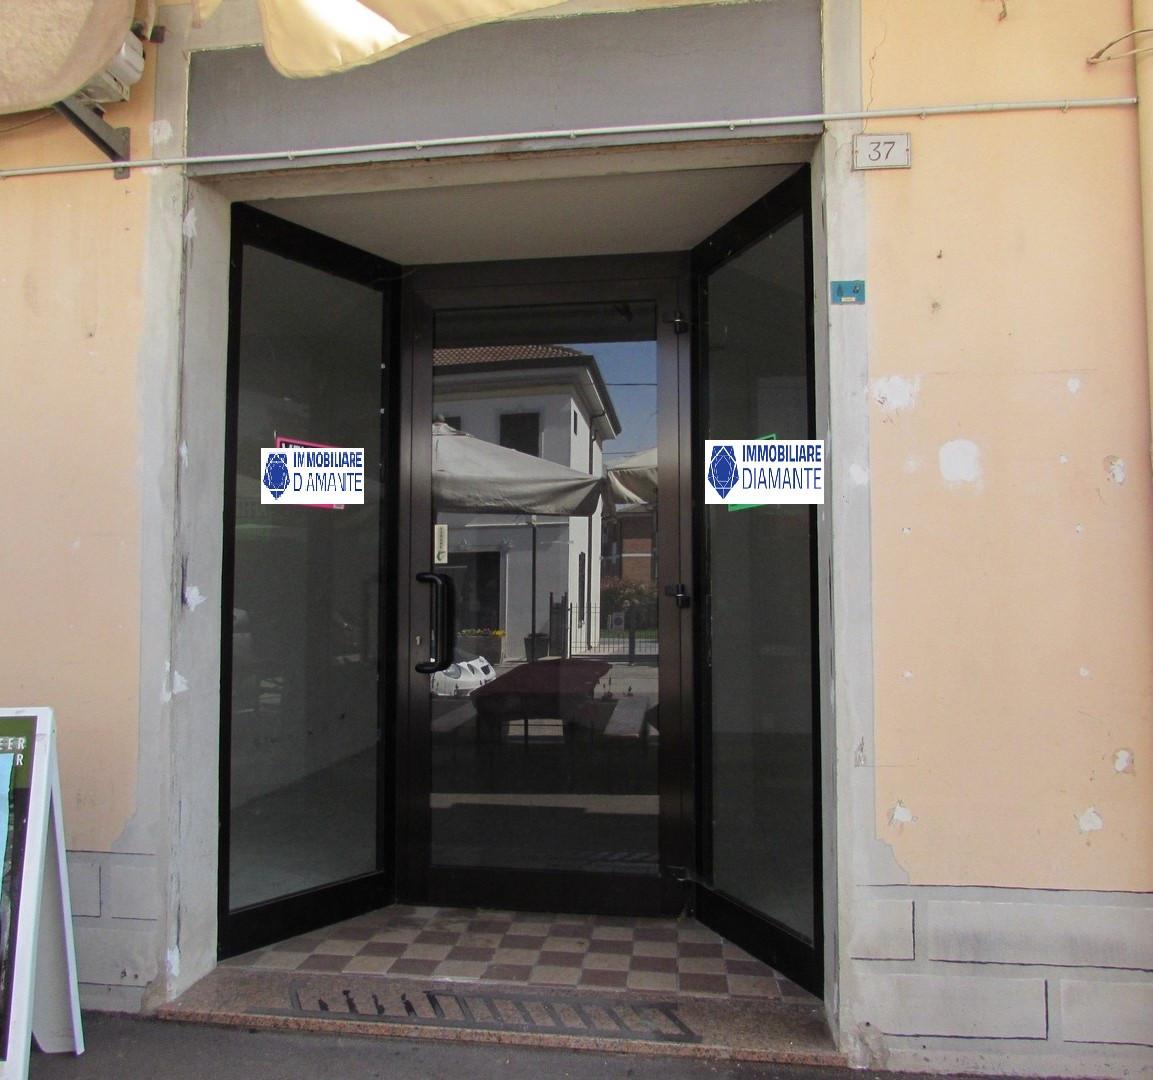 Negozio in vendita Formignana